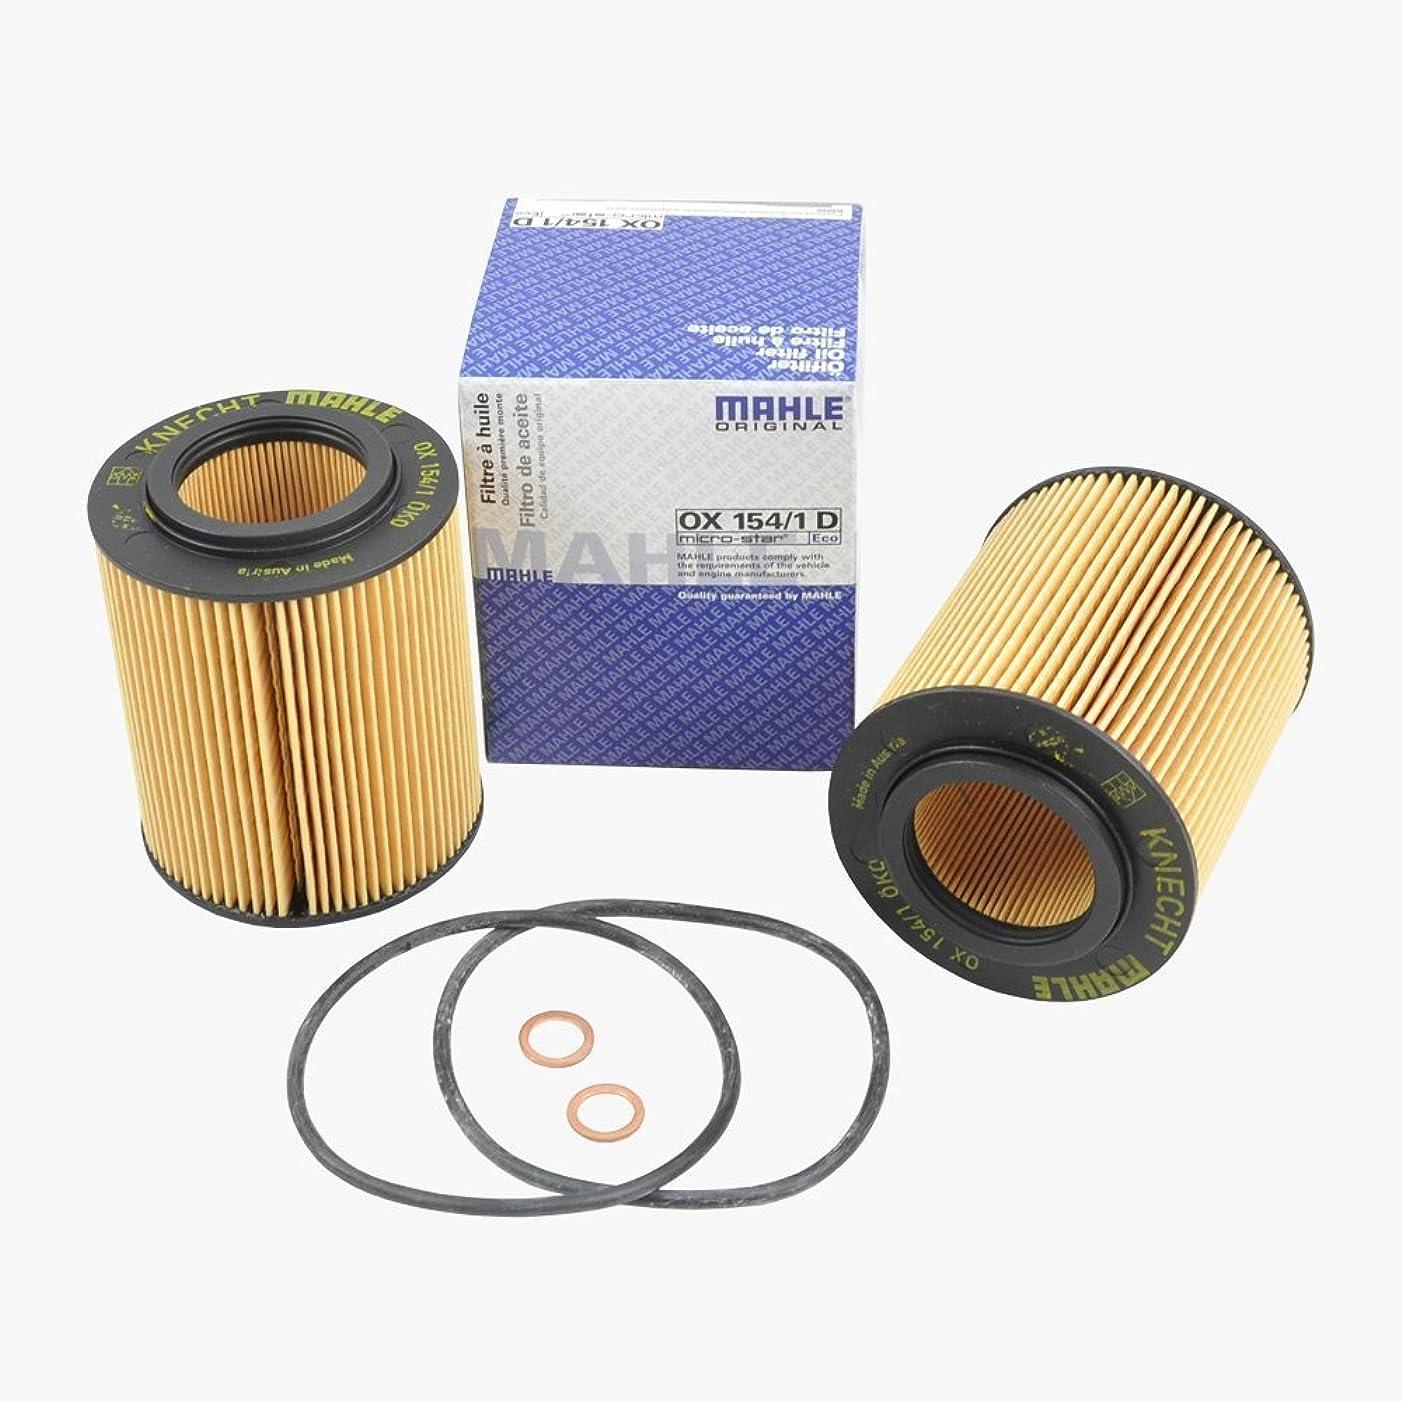 BMW Engine Oil Filter Mahle Original OEM OX154/1D / 11427512300 (2pcs)